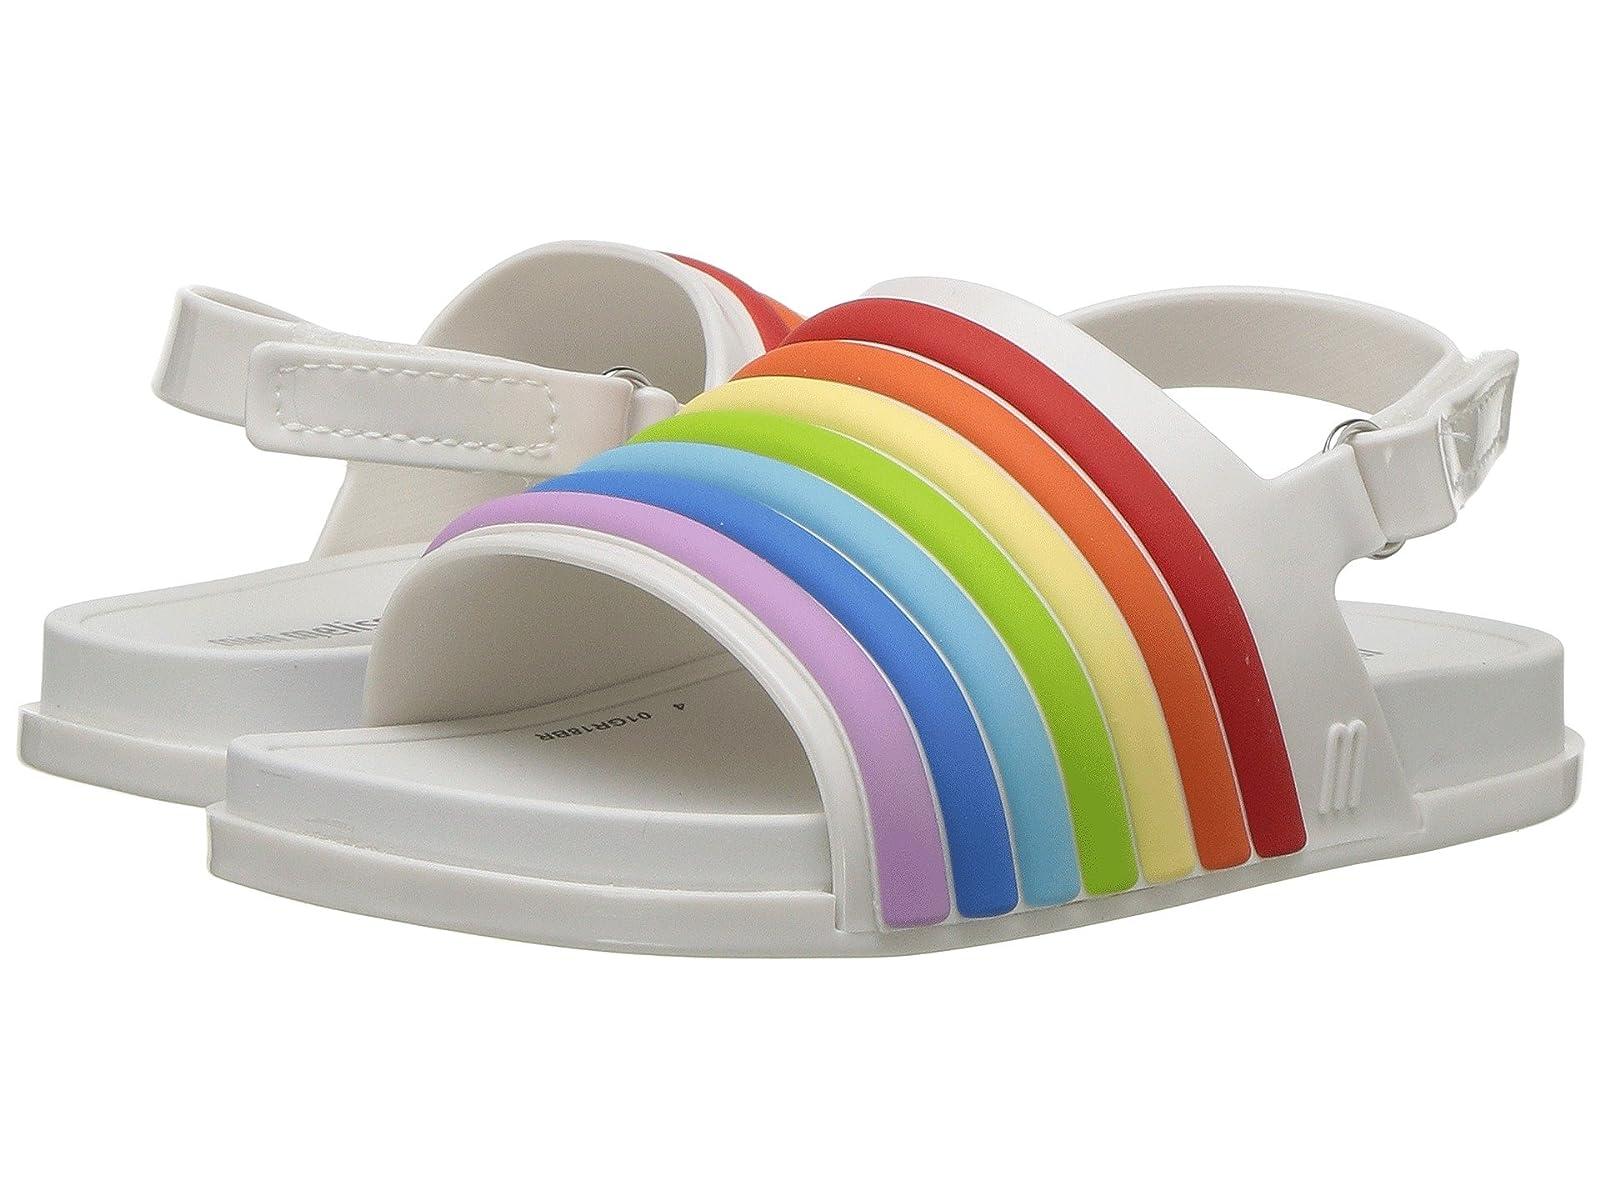 Mini Melissa Mini Beach Slide Sandal Rainbow (Toddler/Little Kid)Atmospheric grades have affordable shoes